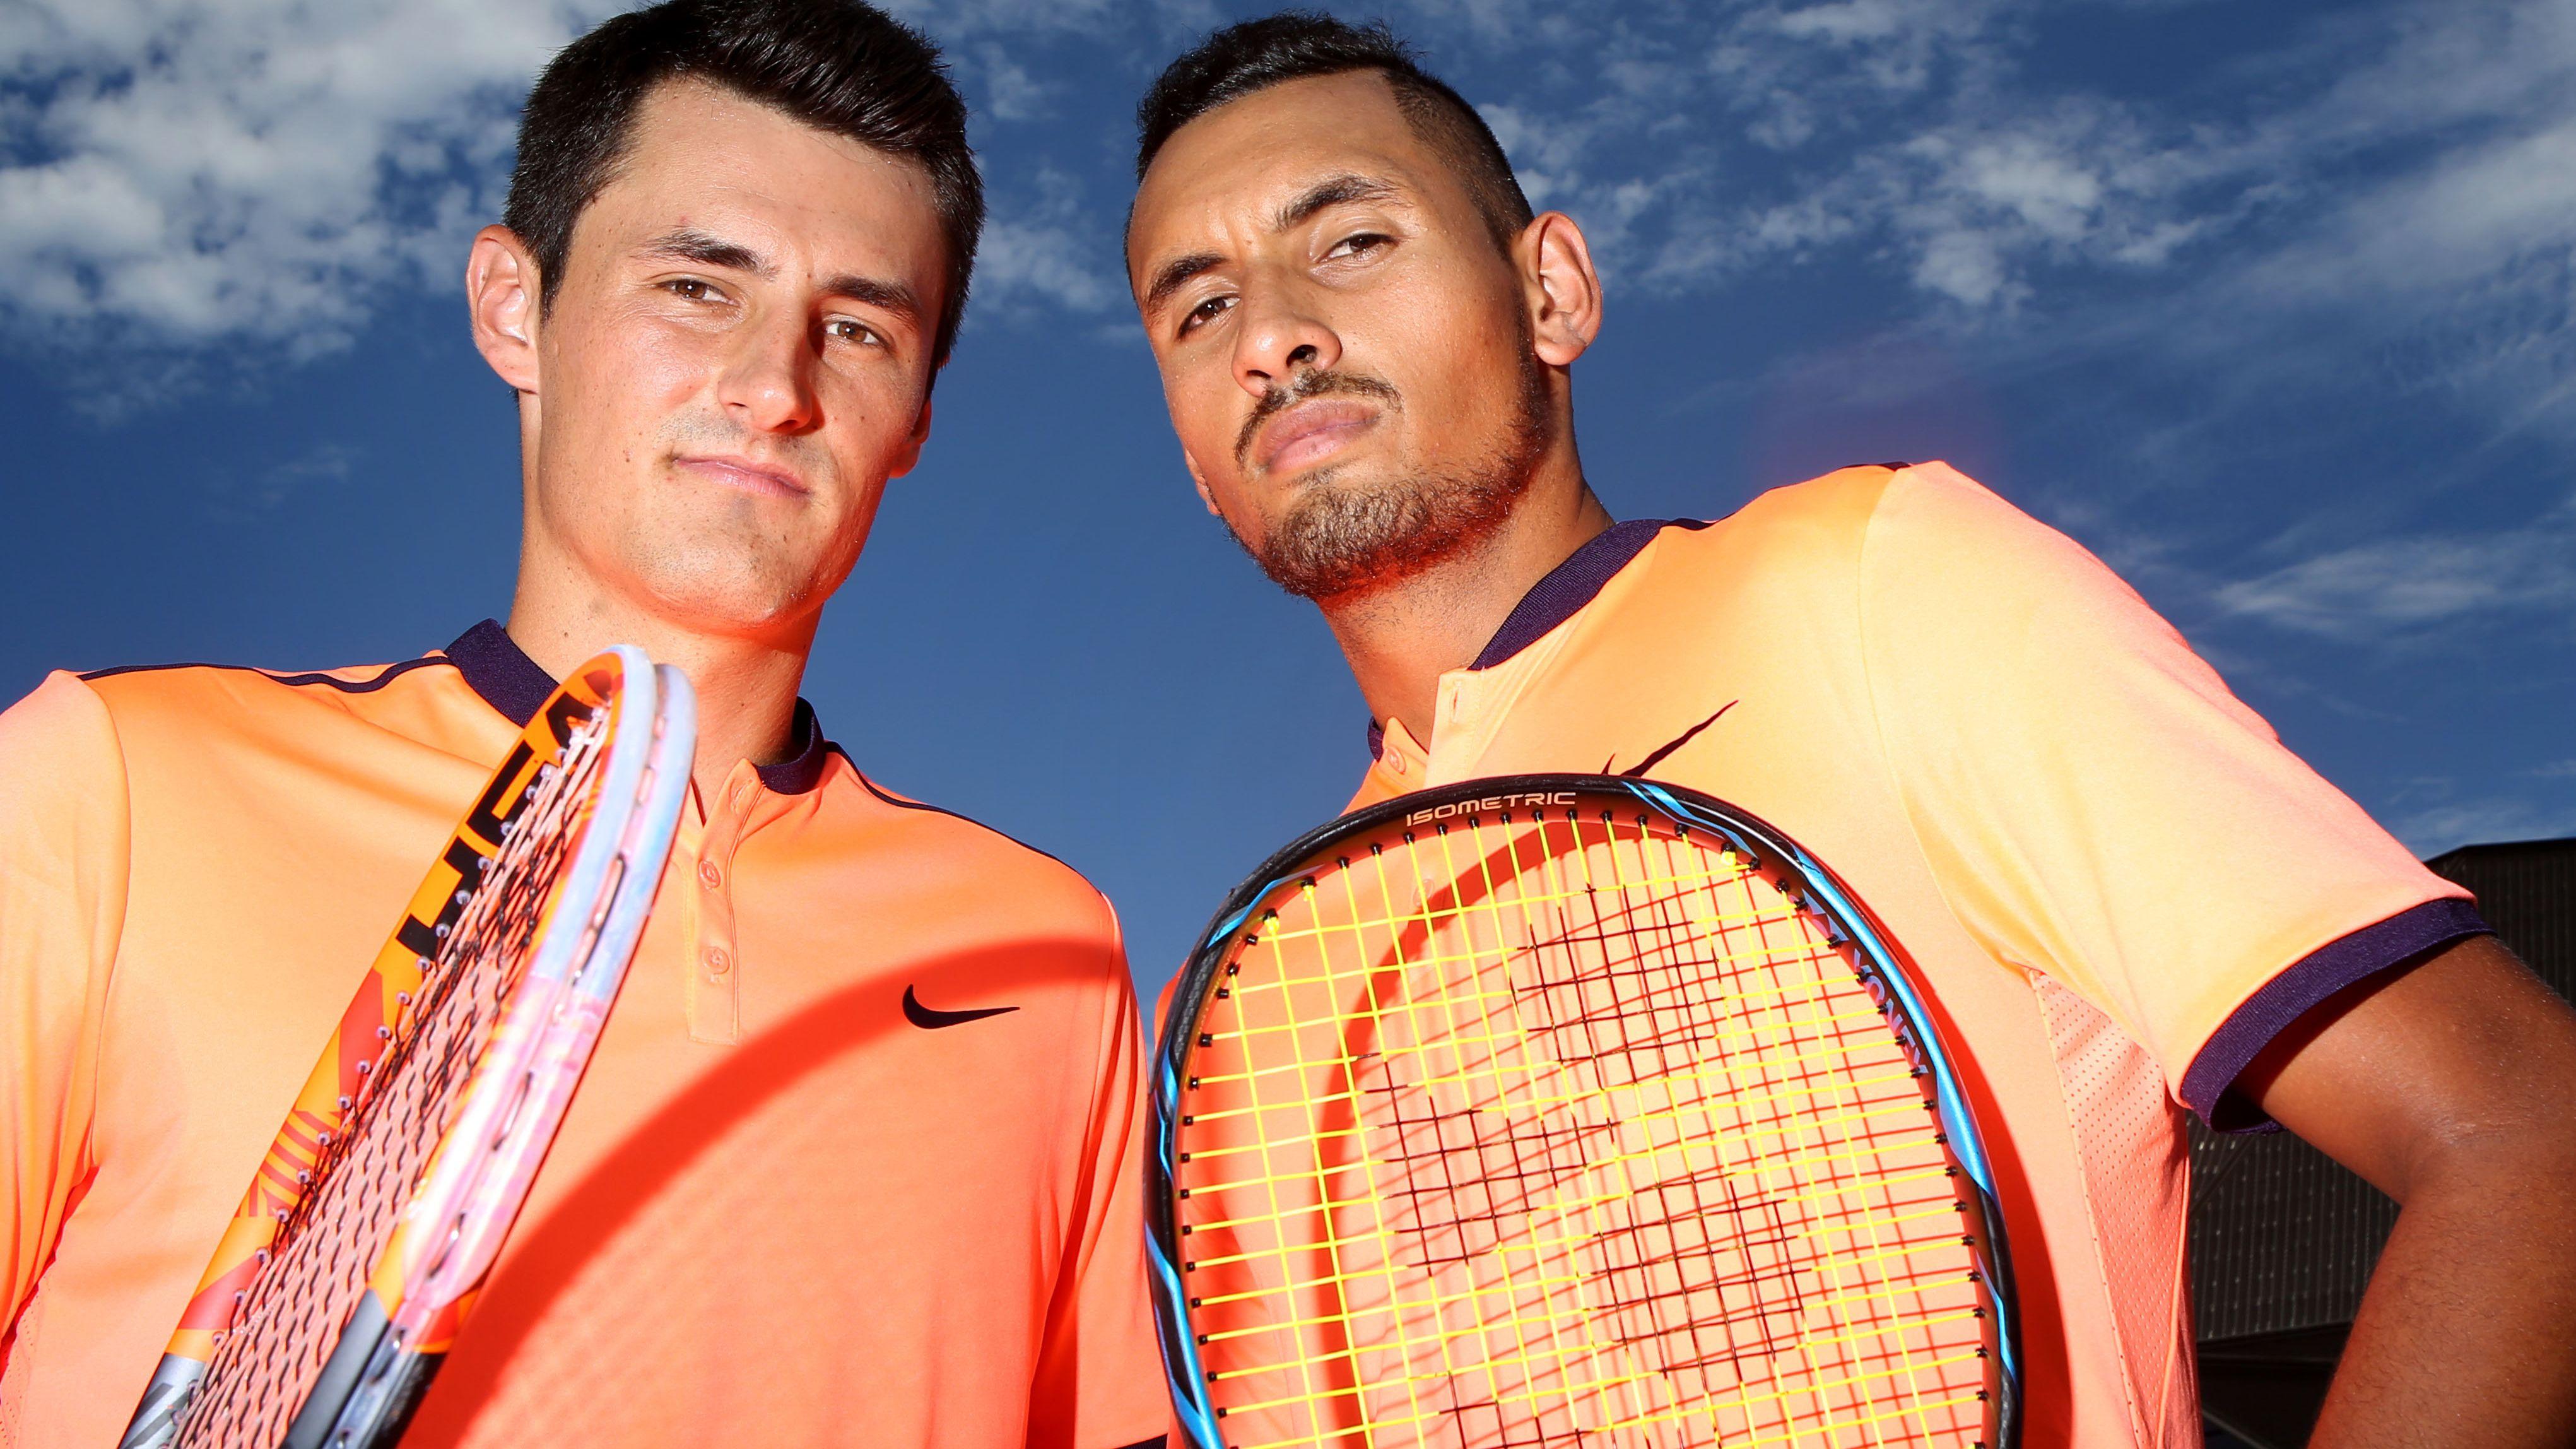 Bernard Tomic and Nick Kyrgios